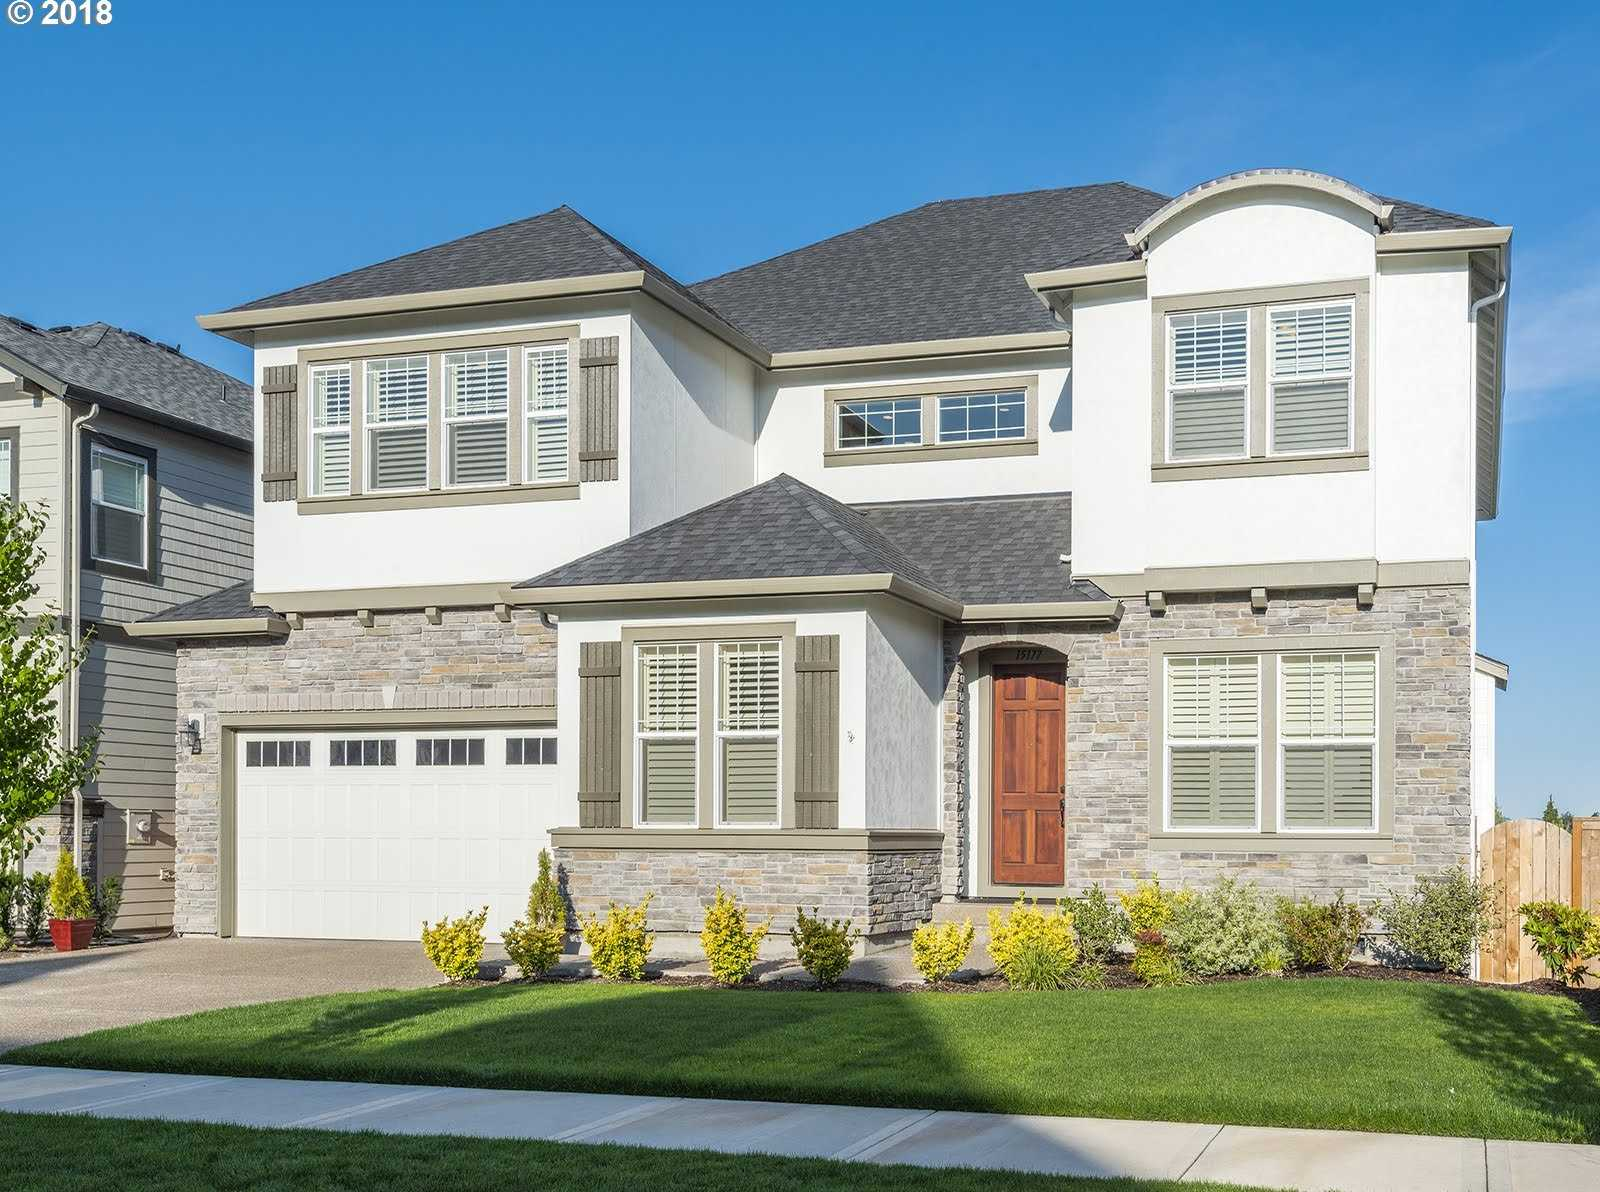 $825,000 - 4Br/3Ba -  for Sale in Estates At River Terrace, Tigard